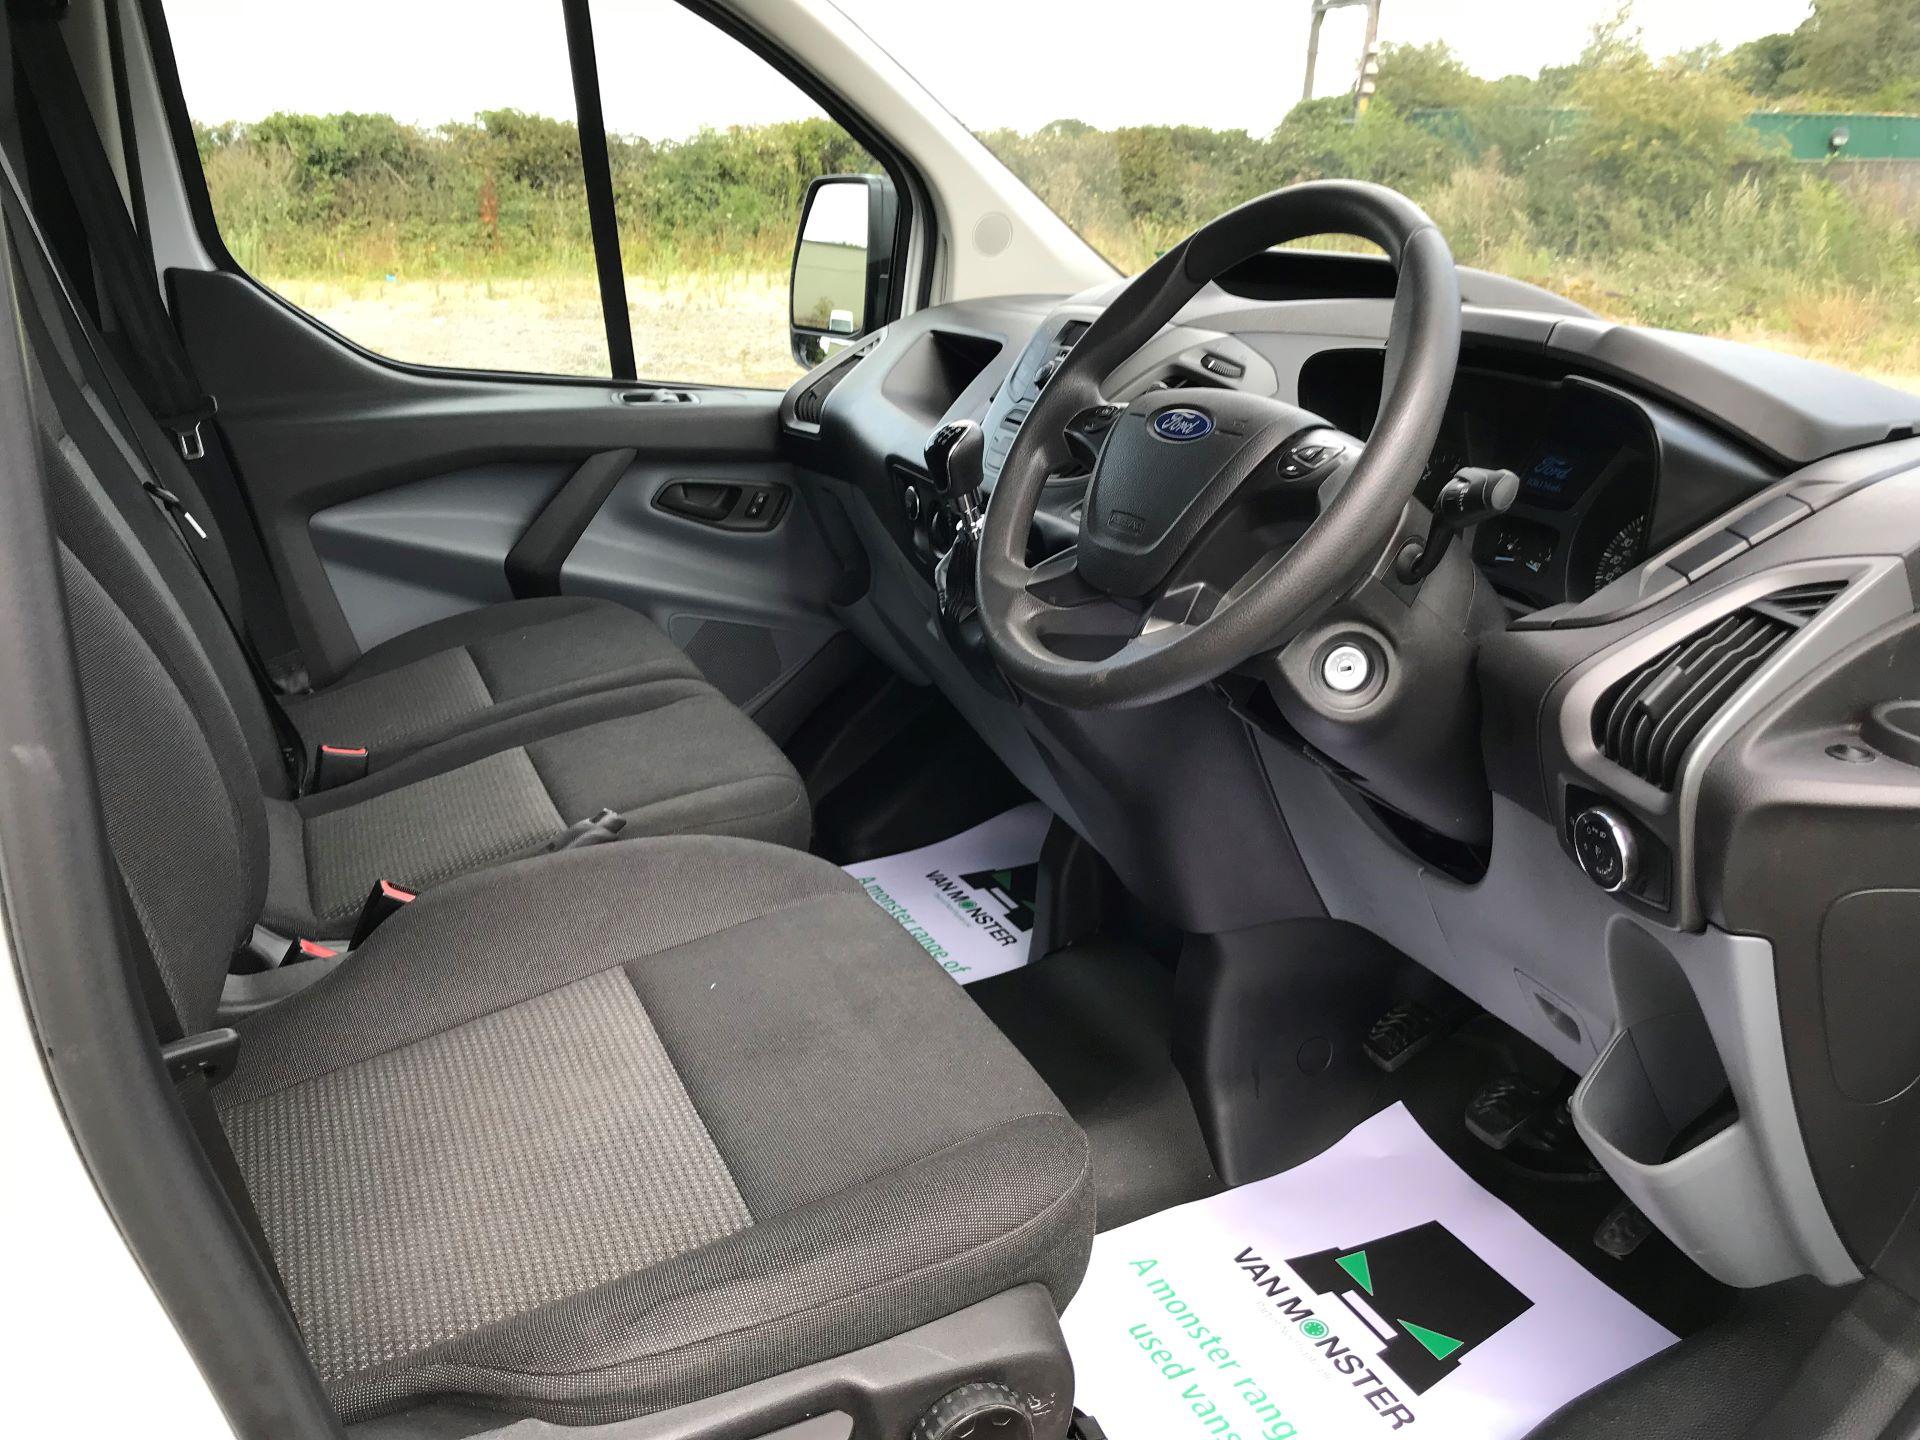 2016 Ford Transit Custom 290 L1 DIESEL FWD 2.2 TDCI 100PS LOW ROOF VAN EURO 5 (FA16UOD) Image 21